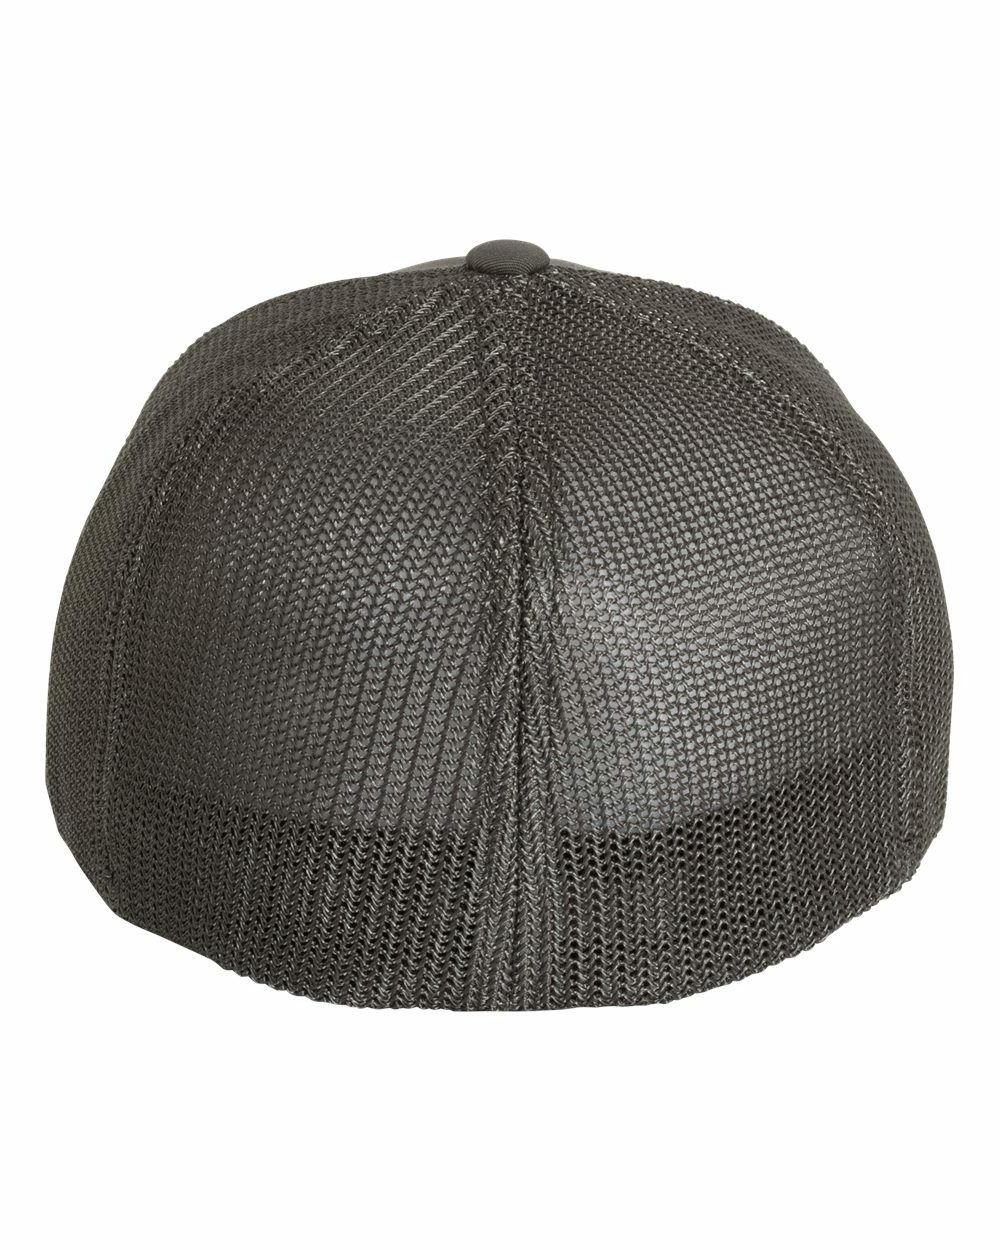 Flexfit - - 6511 fitted mesh back FLEX